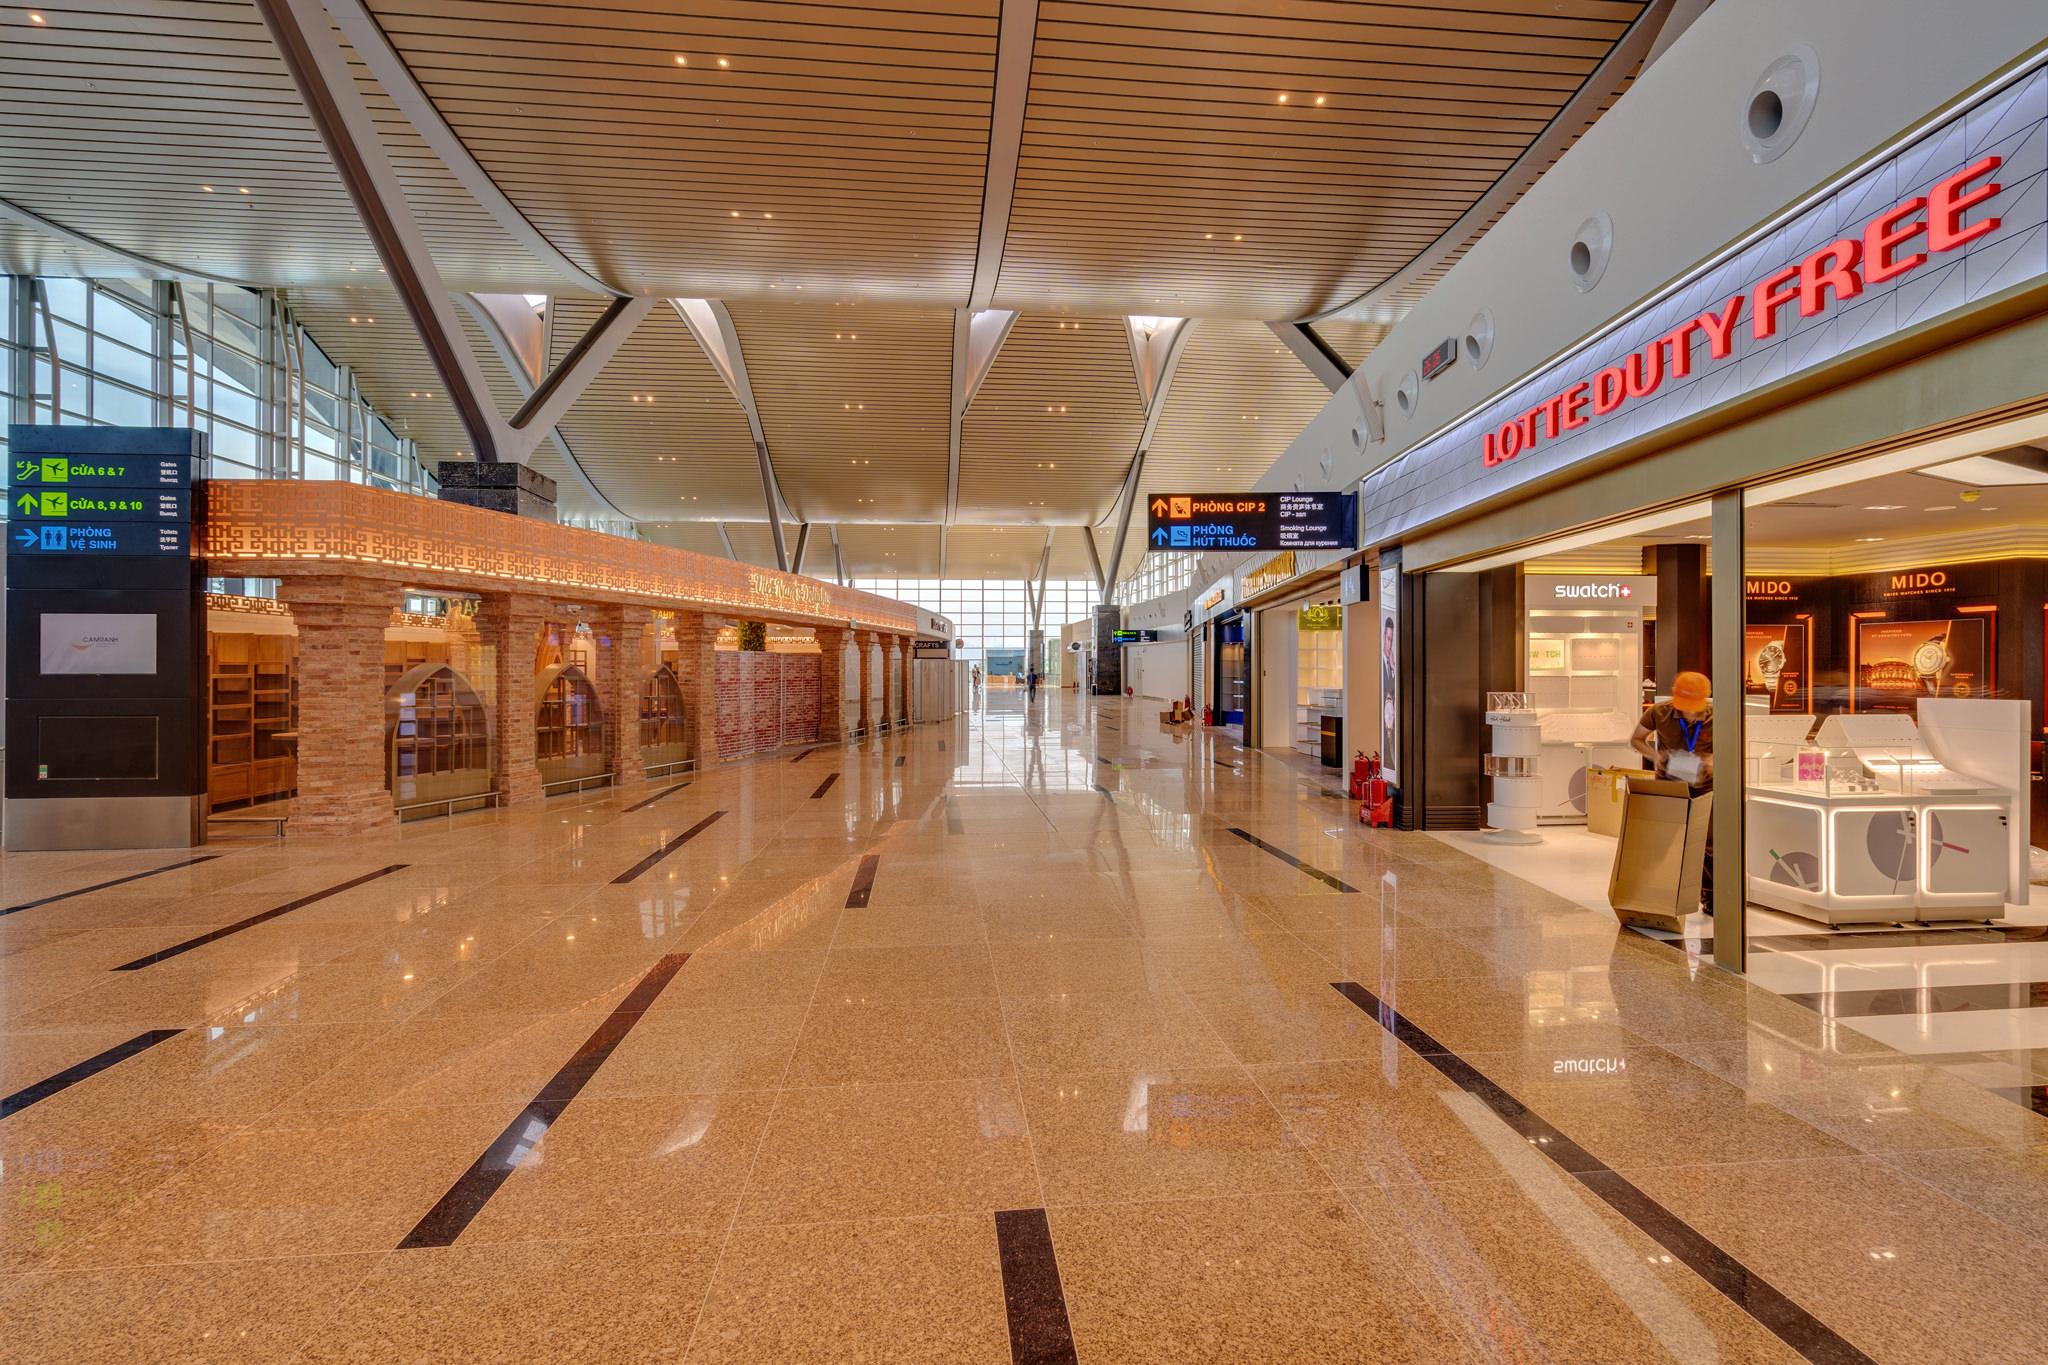 20180626 - Cam Ranh Airport - Architecture - 0339.jpg